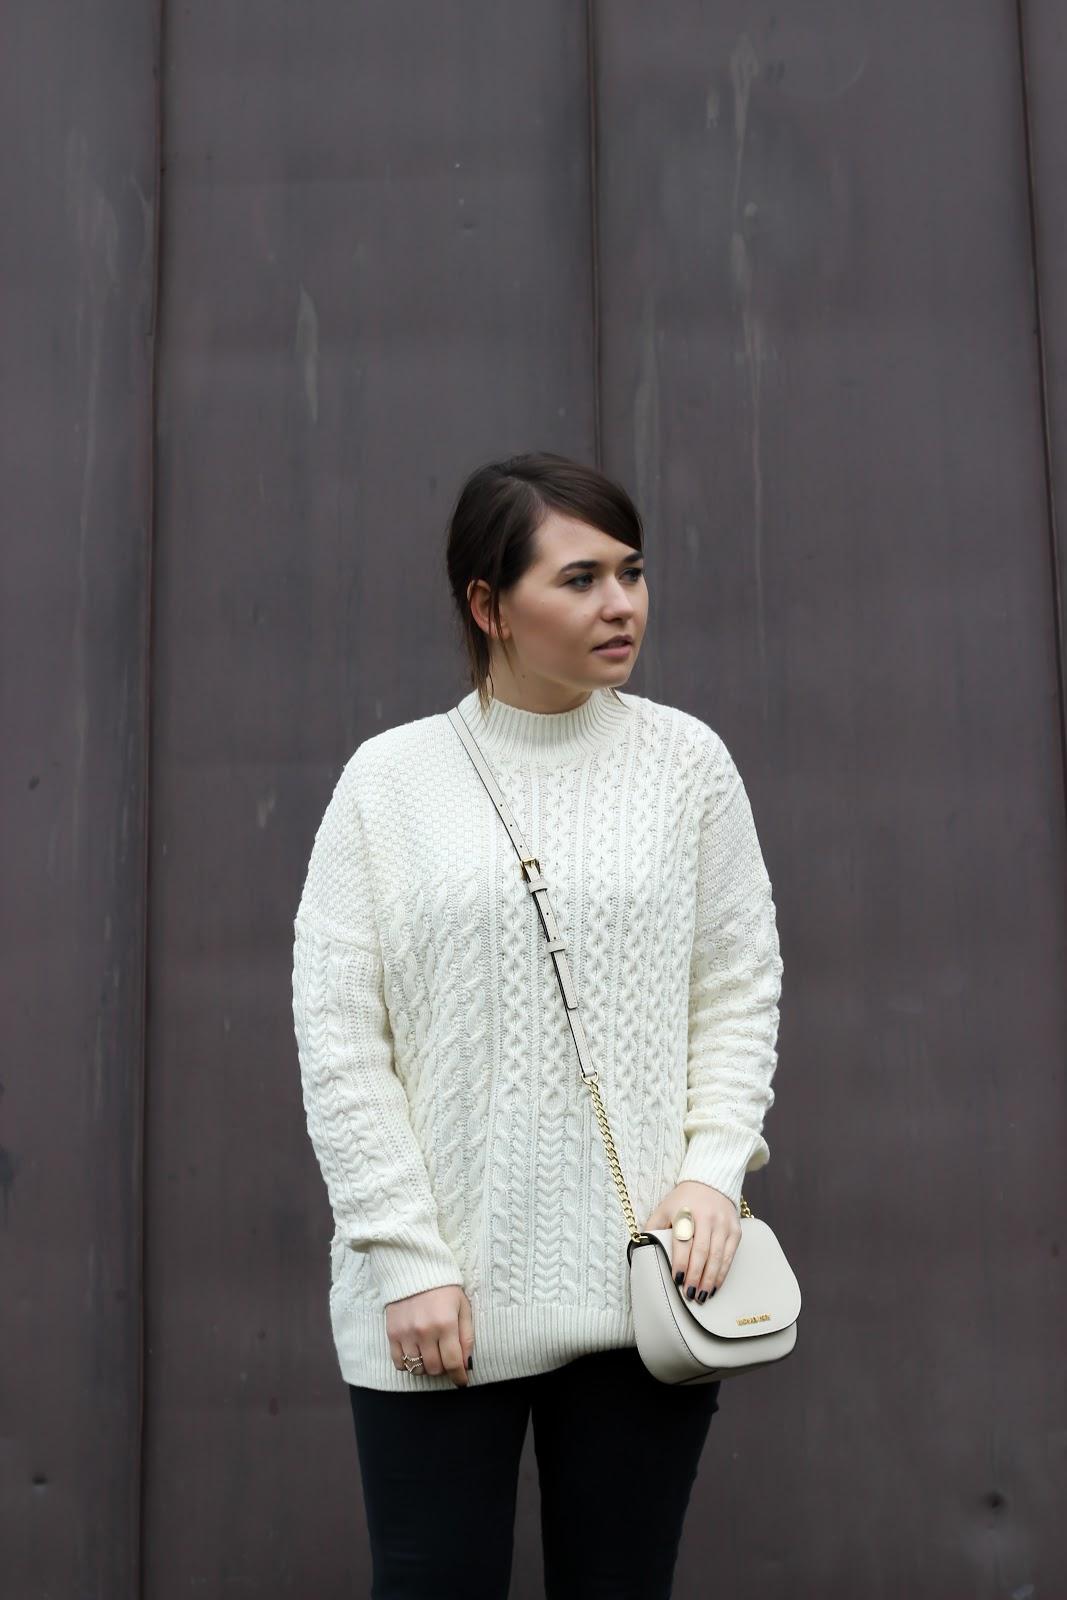 Michael Kors Topshop Knit